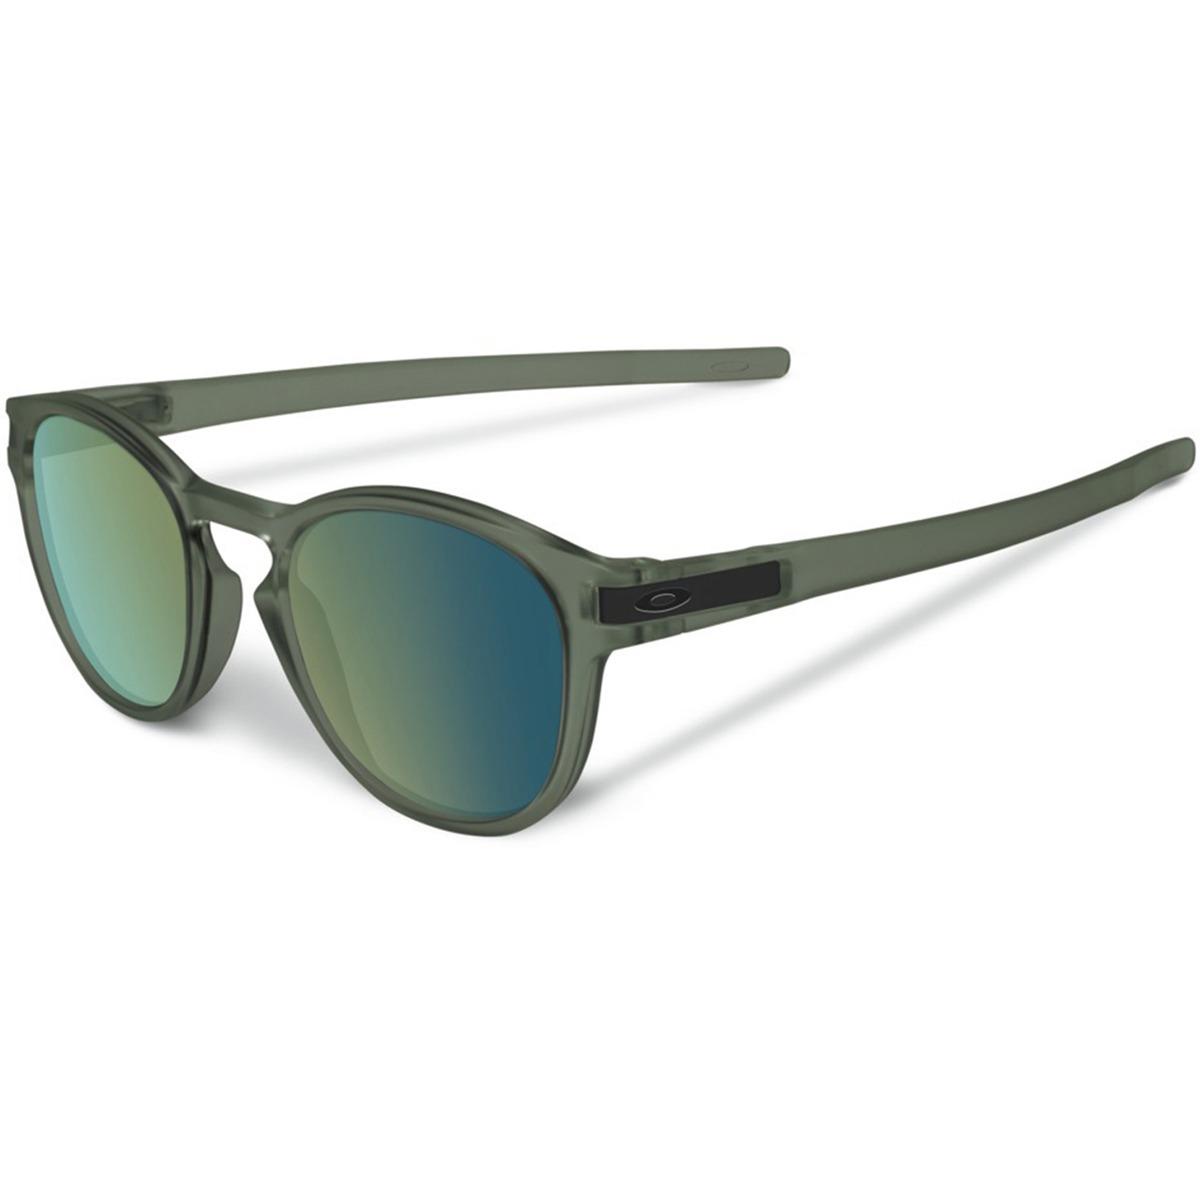 5836b725dc6cd óculos oakley latch matte olive ink lente emerald iridium. Carregando zoom.